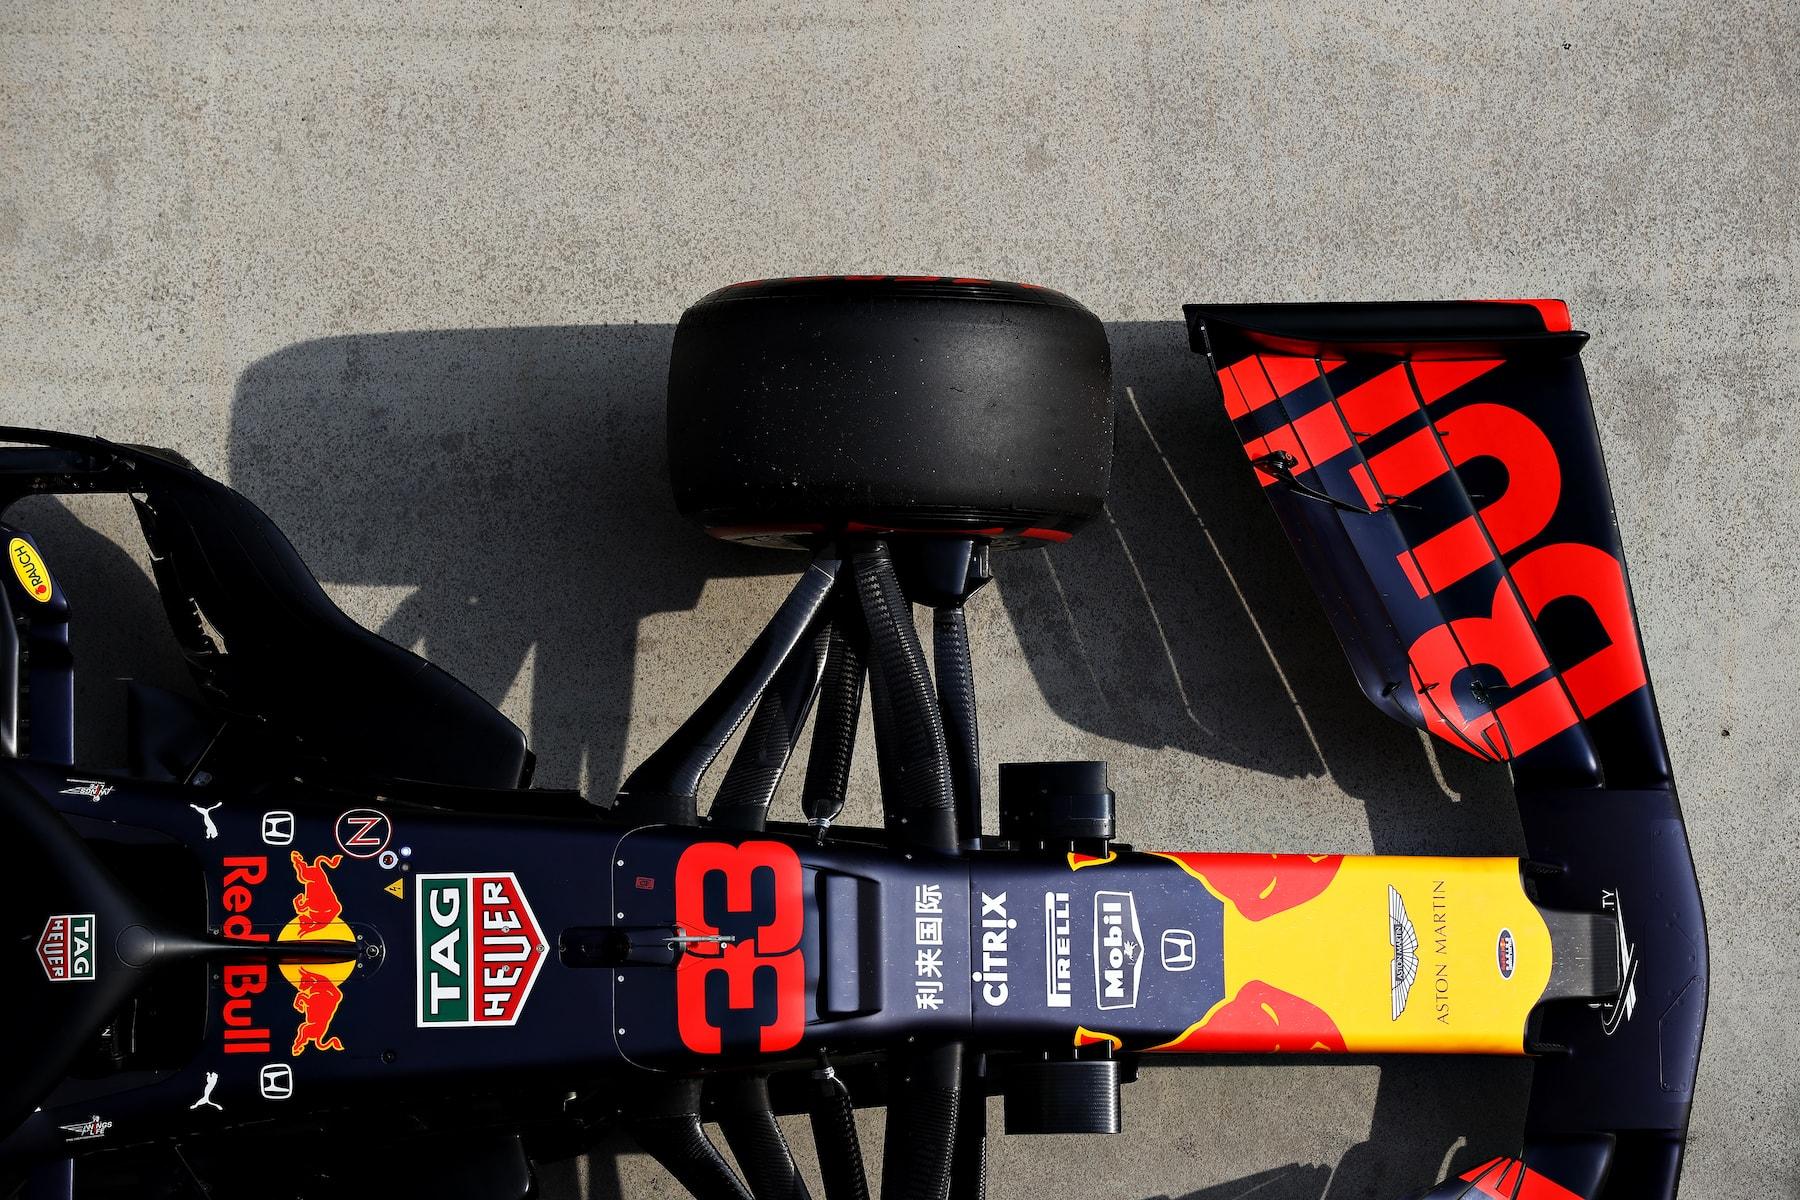 2 2019 Max Verstappen | Red Bull RB15 | 2019 Chinese GP Q 2 copy.jpg